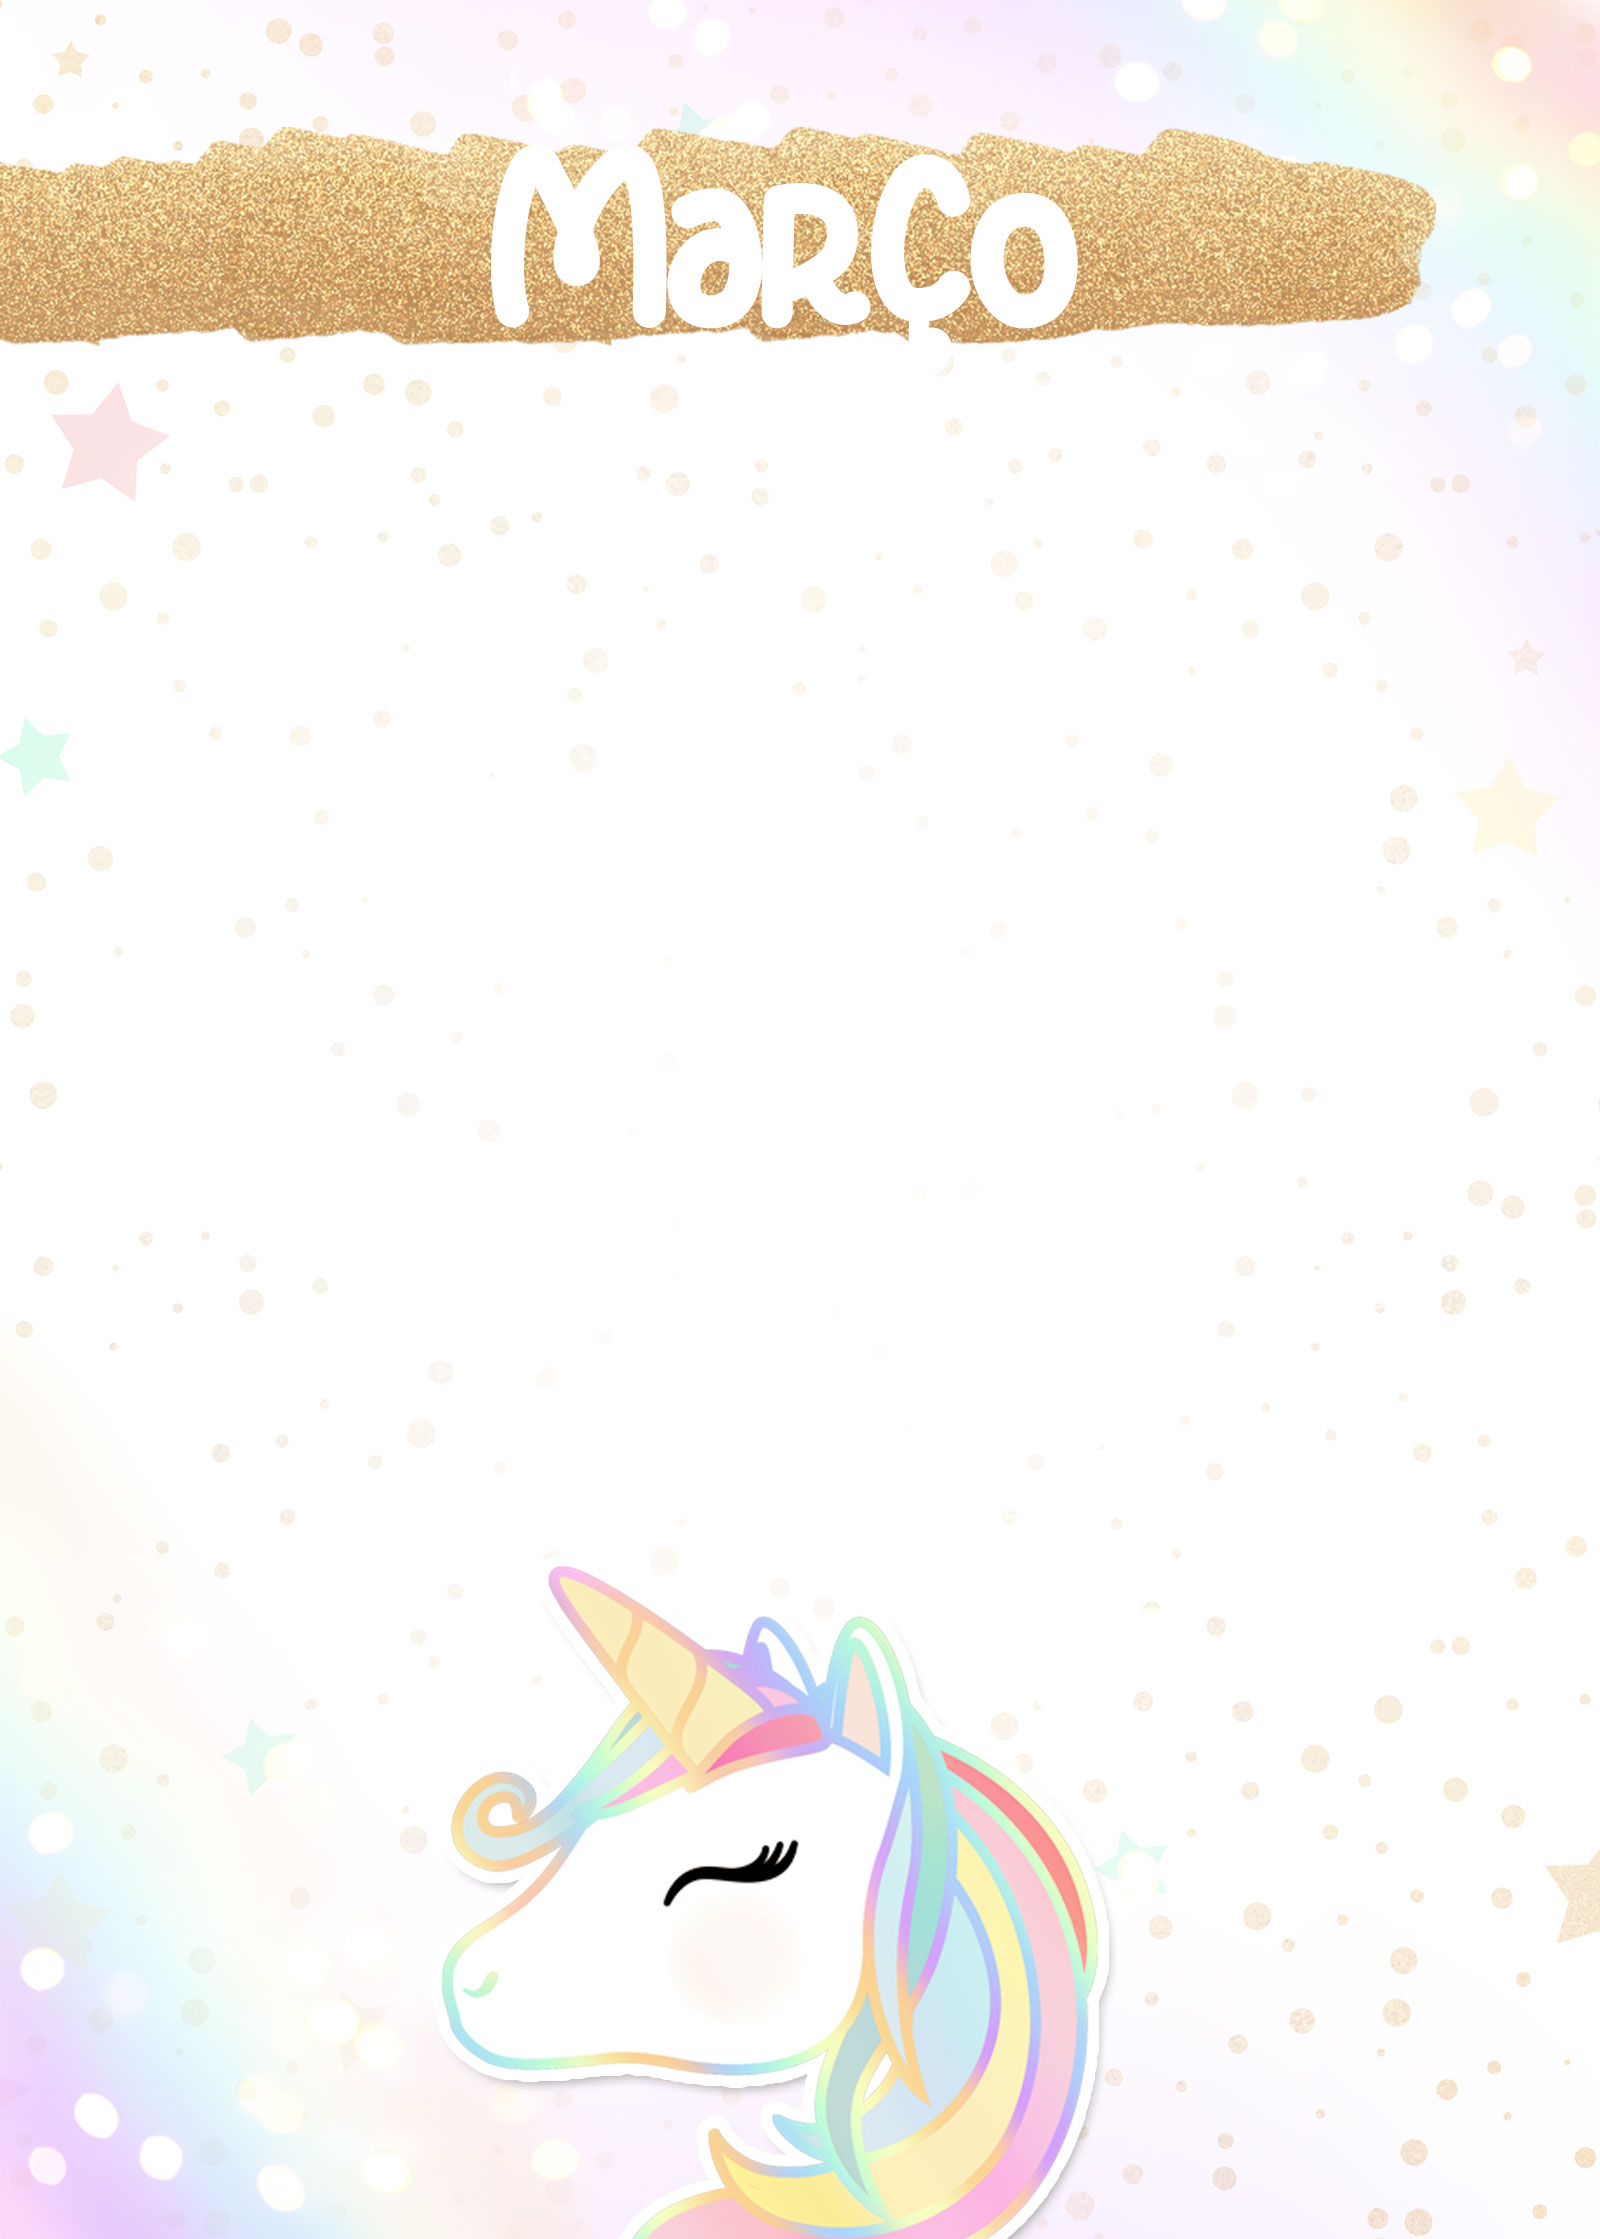 Planner Unicornio 2019 capa marco